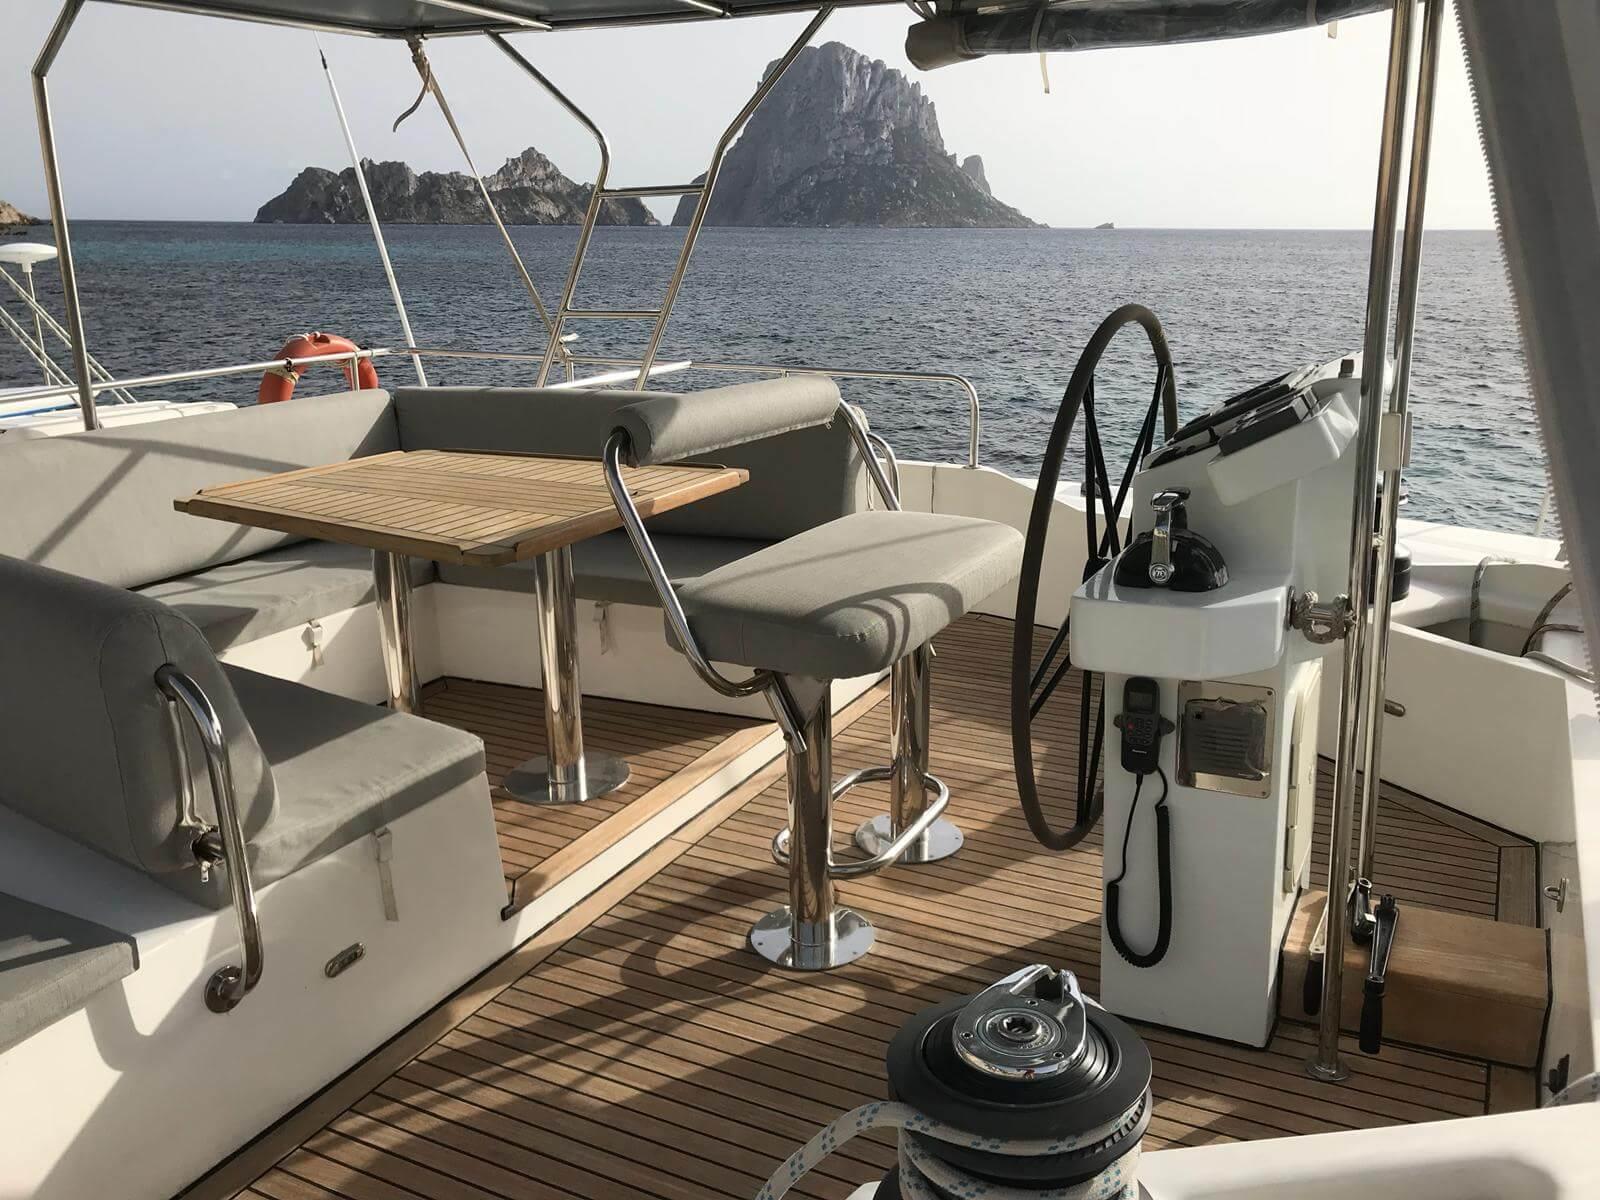 Catamarans ZAHORA, Manufacturer: SUNREEF, Model Year: 2008, Length: 62ft, Model: Sunreef 62, Condition: Used, Status: Catamaran for Sale, Price: EUR 675000